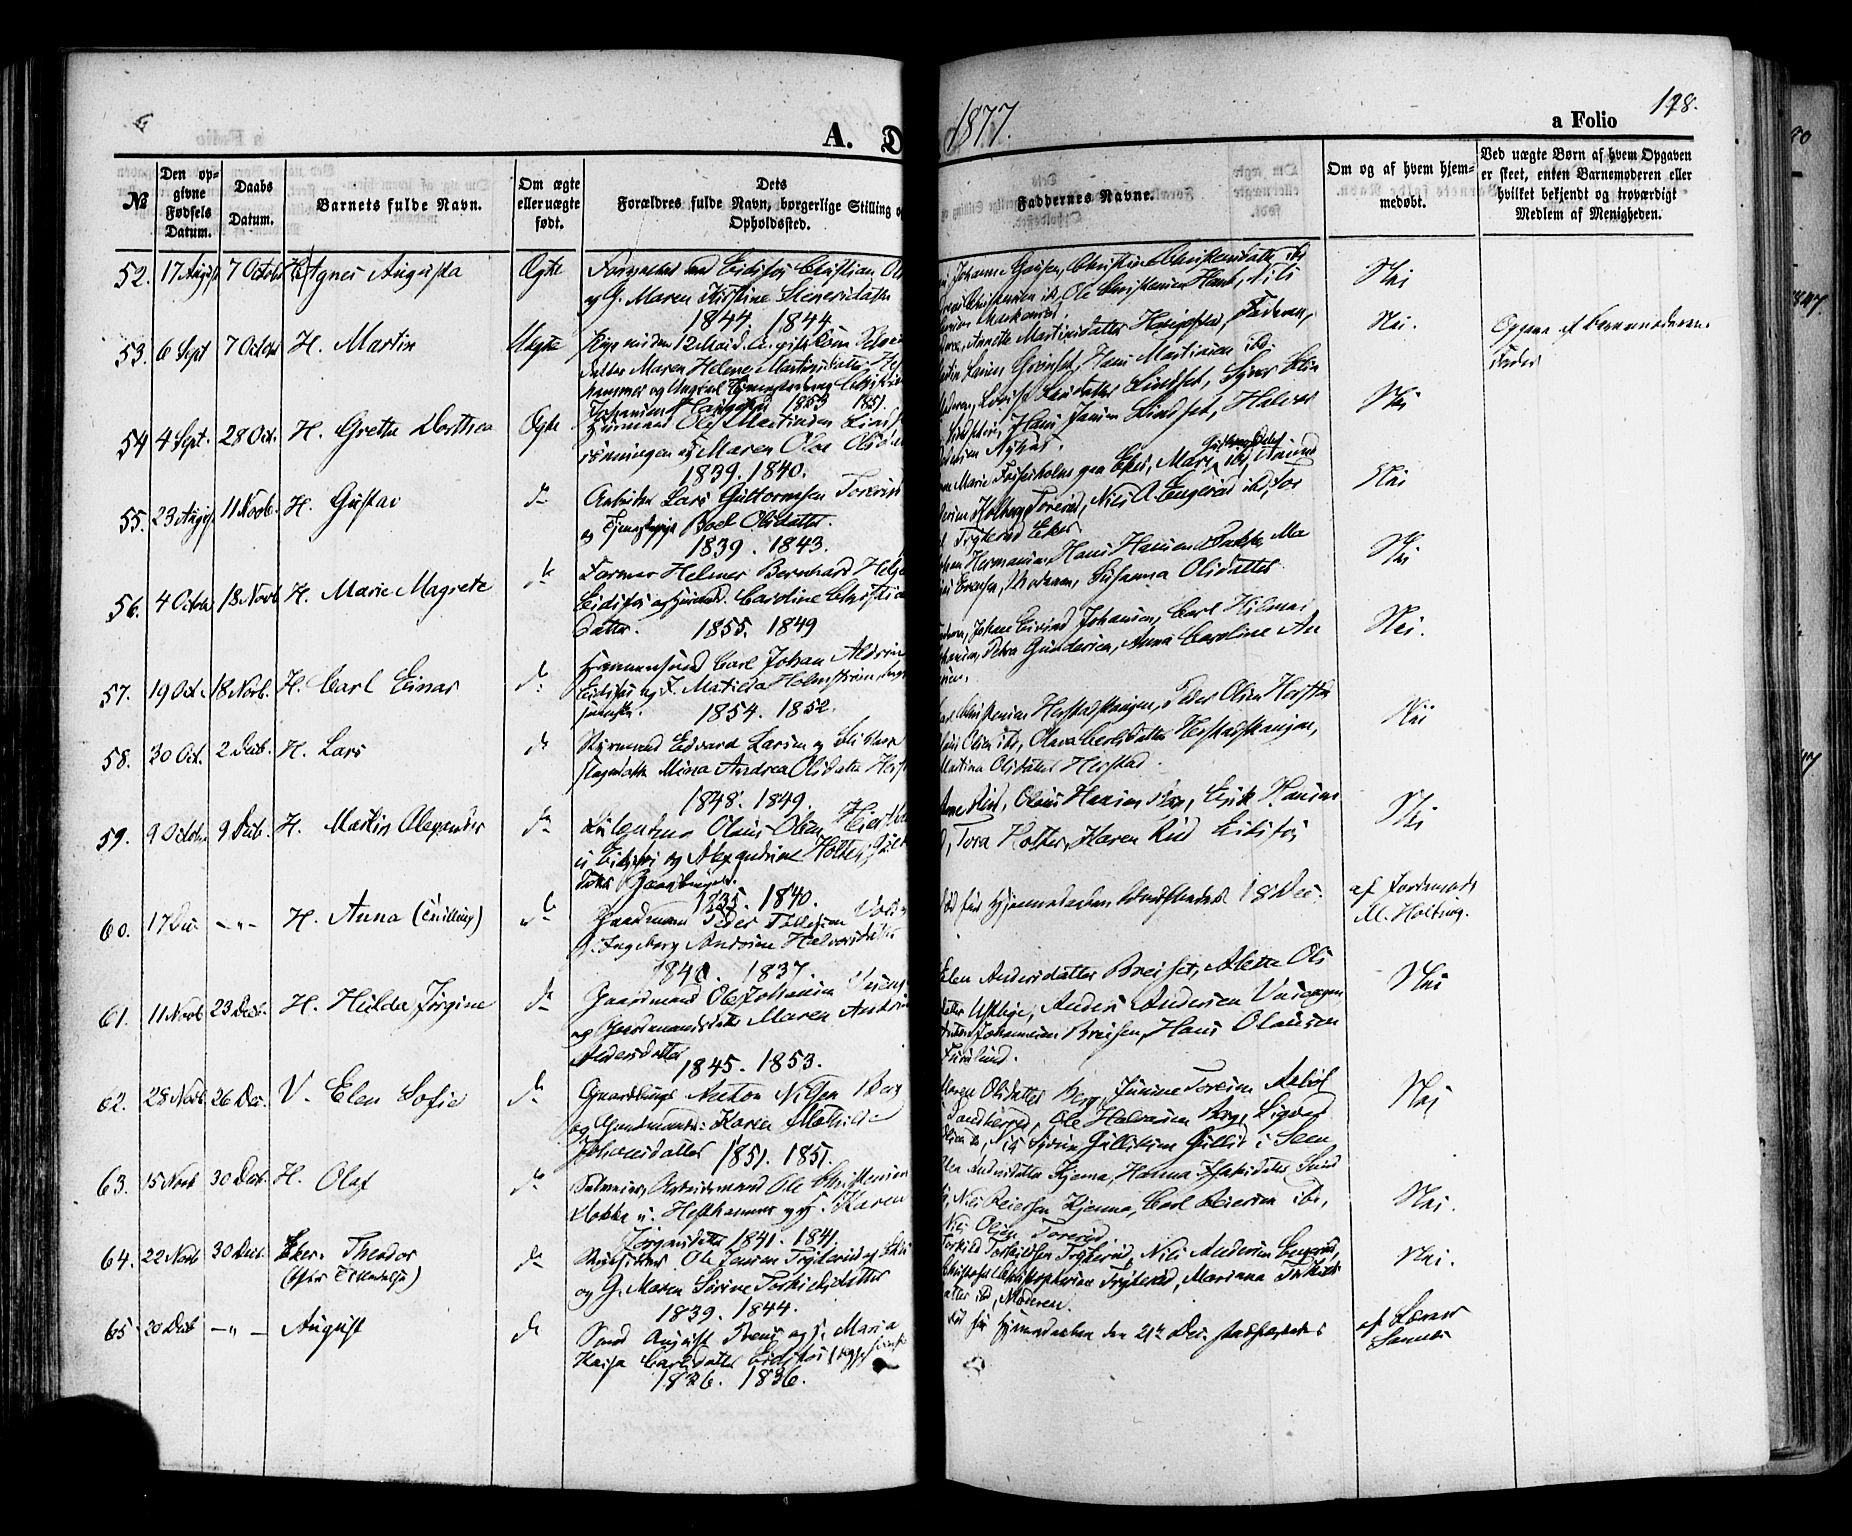 SAKO, Hof kirkebøker, F/Fa/L0006: Ministerialbok nr. I 6, 1851-1877, s. 198